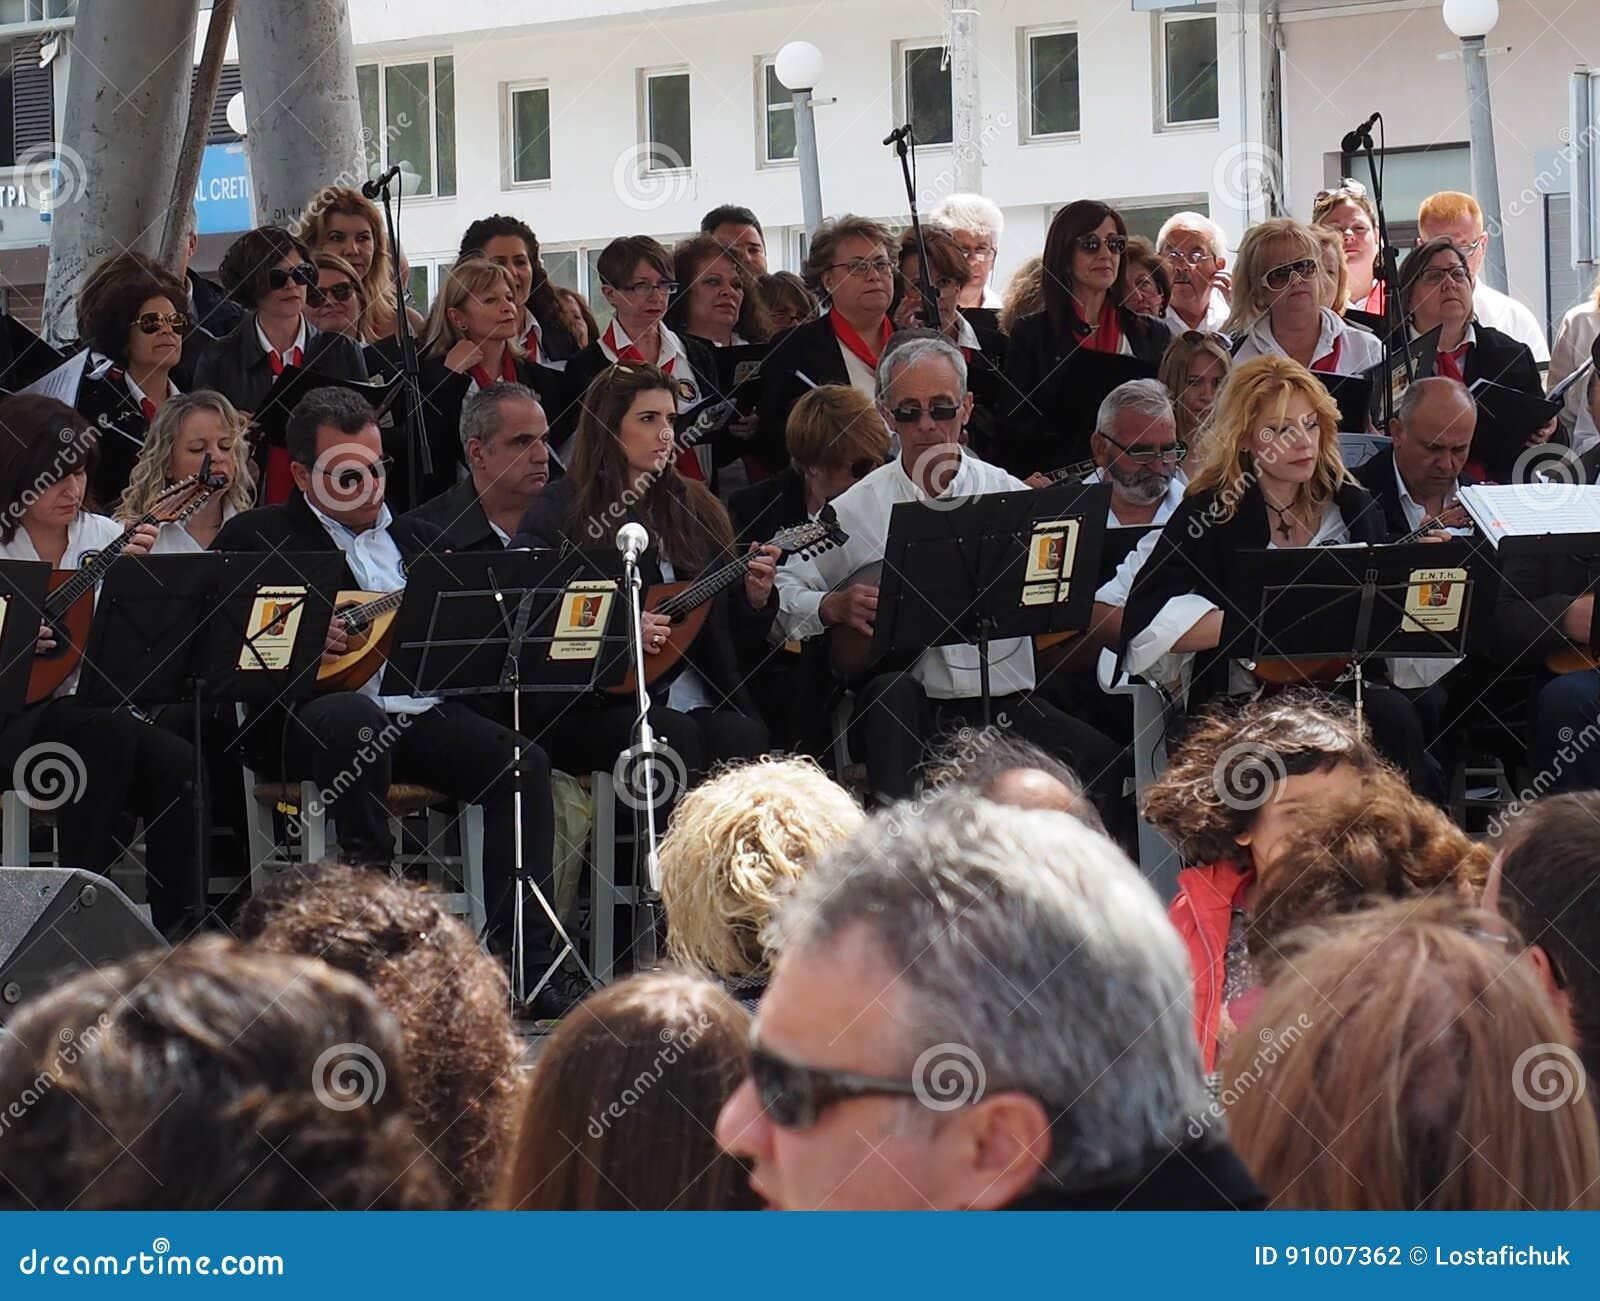 1789faf5abf4 Μουσικοί που παίζουν στην υπαίθρια συναυλία τον Απρίλιο του 2017 Ηρακλείου  Κρήτη Ελλάδα